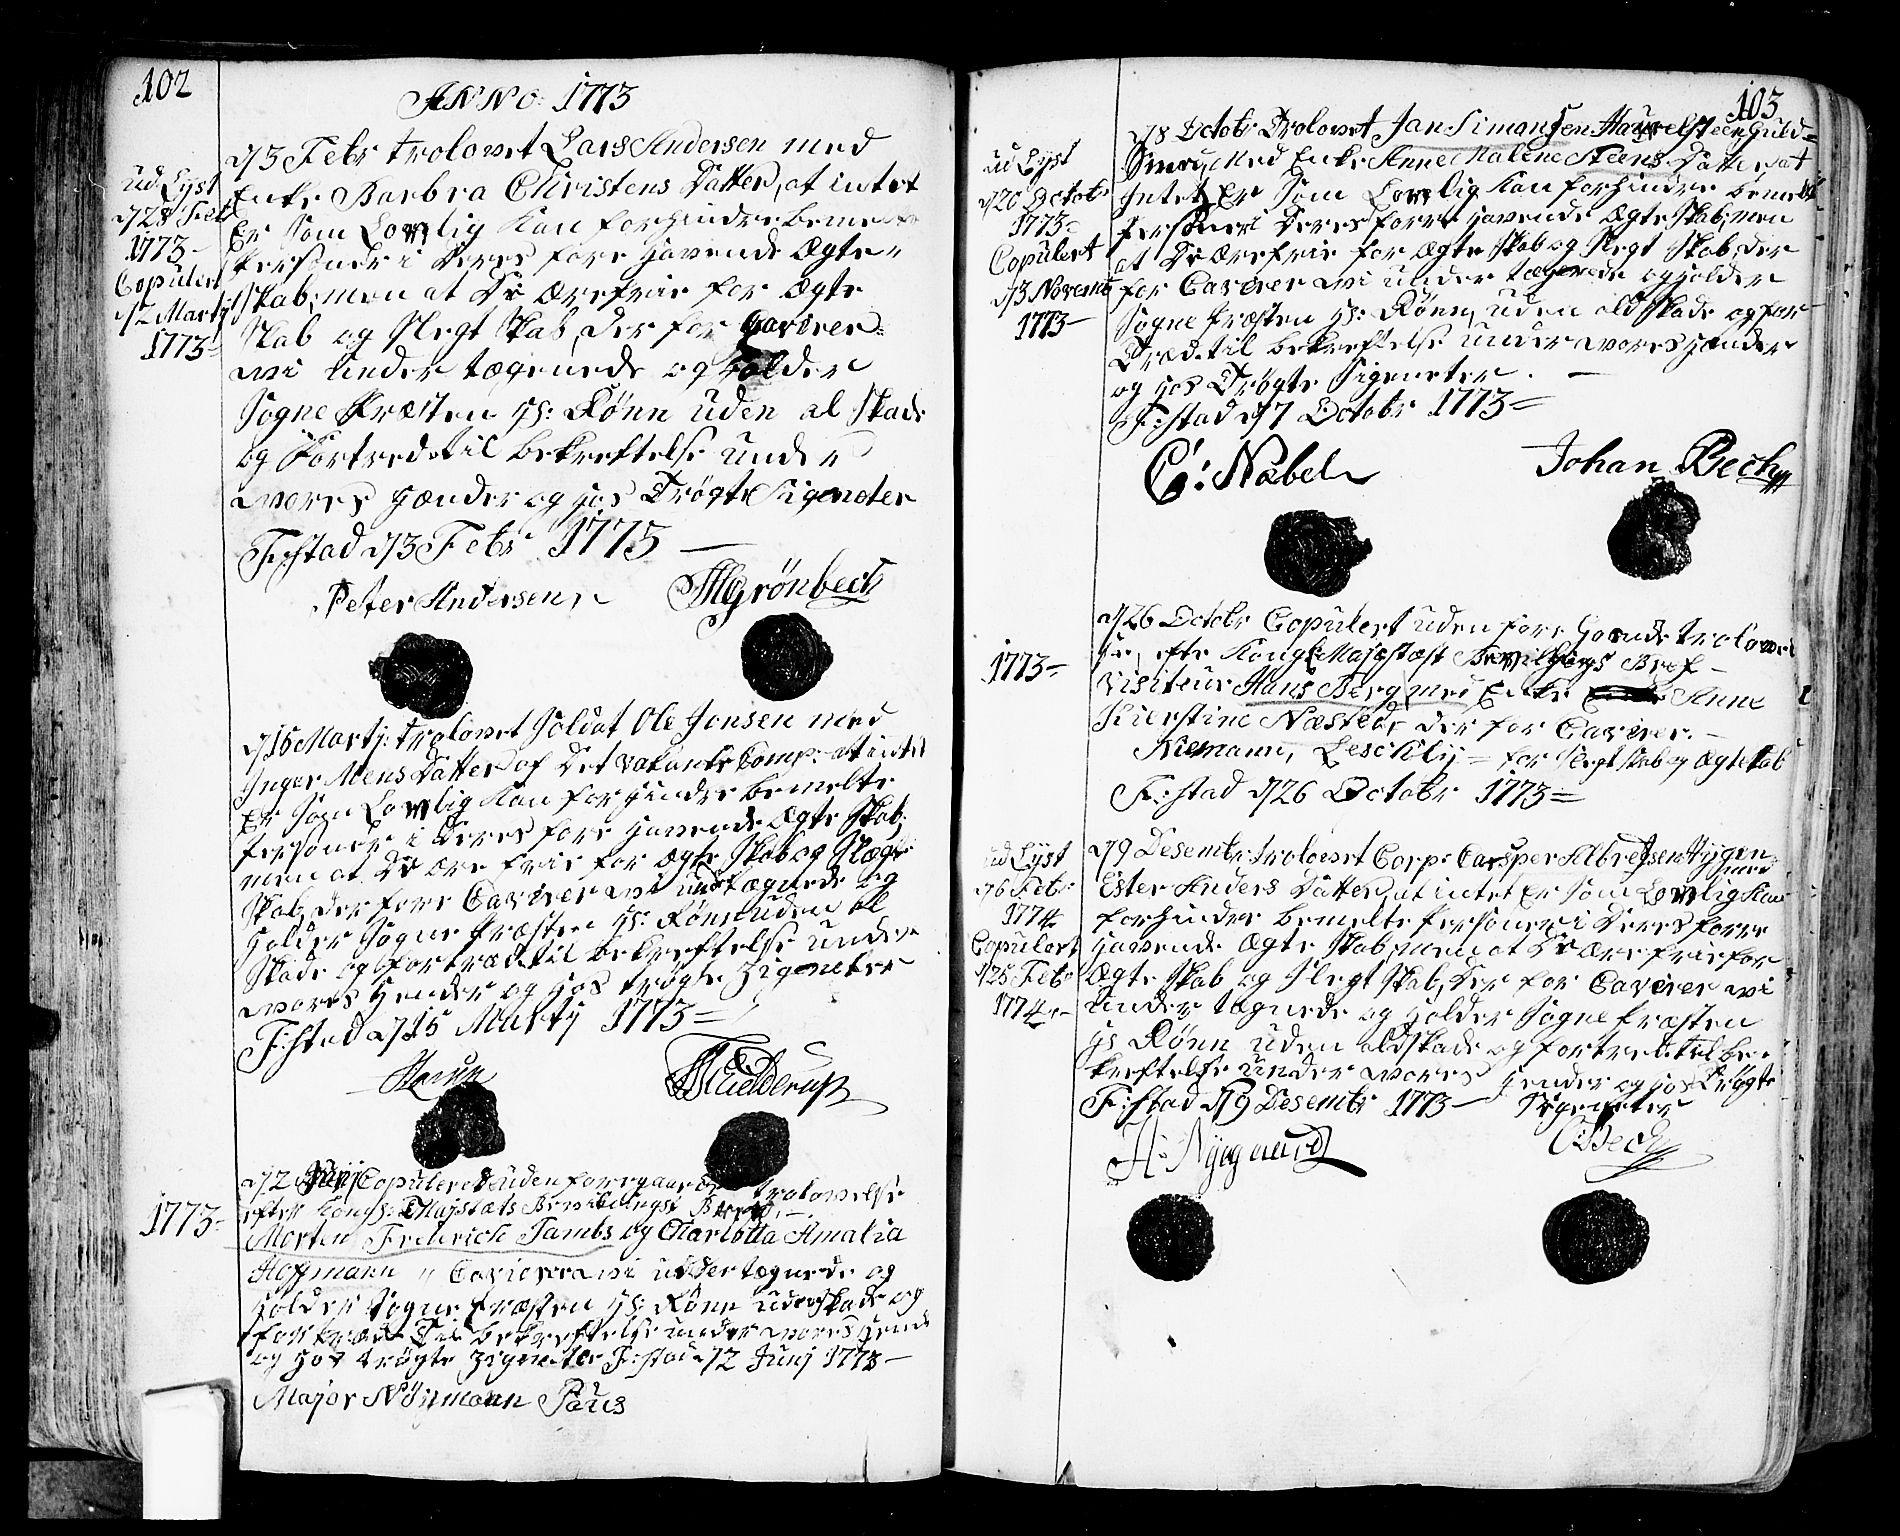 SAO, Fredrikstad prestekontor Kirkebøker, F/Fa/L0002: Ministerialbok nr. 2, 1750-1804, s. 102-103